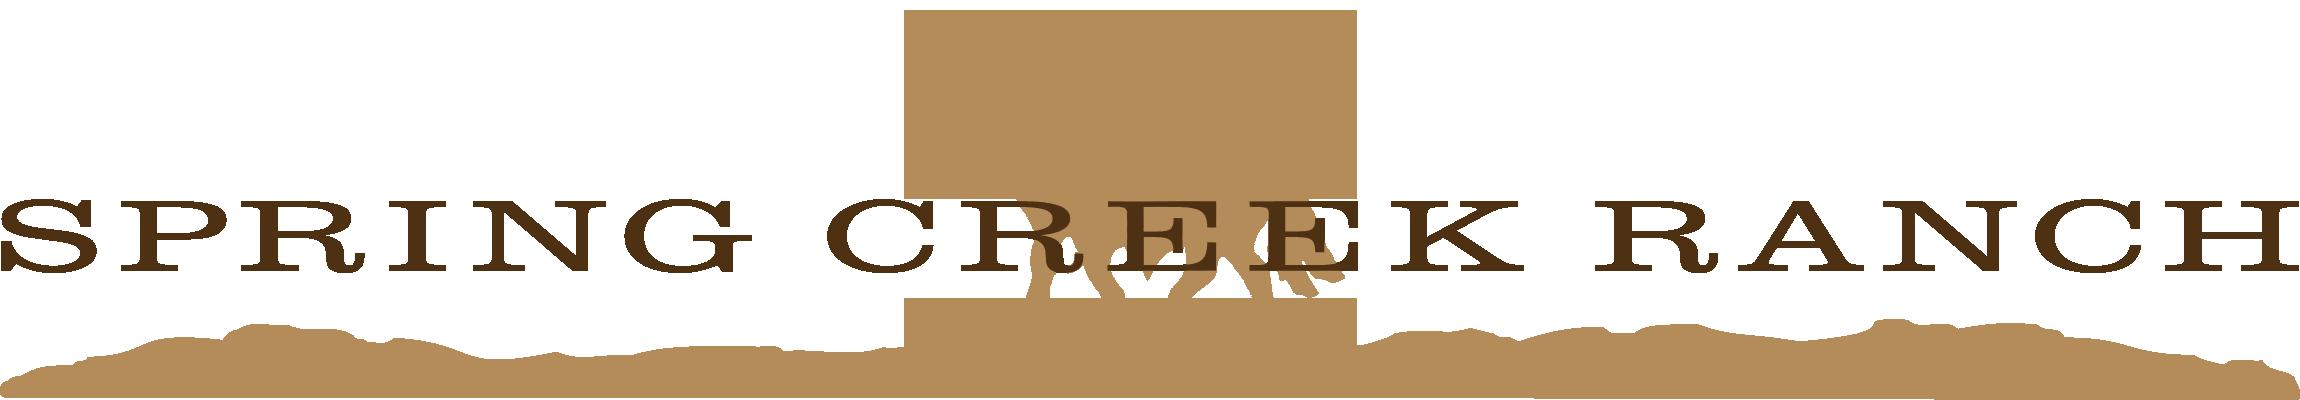 Spring Creek Ranch logo.png